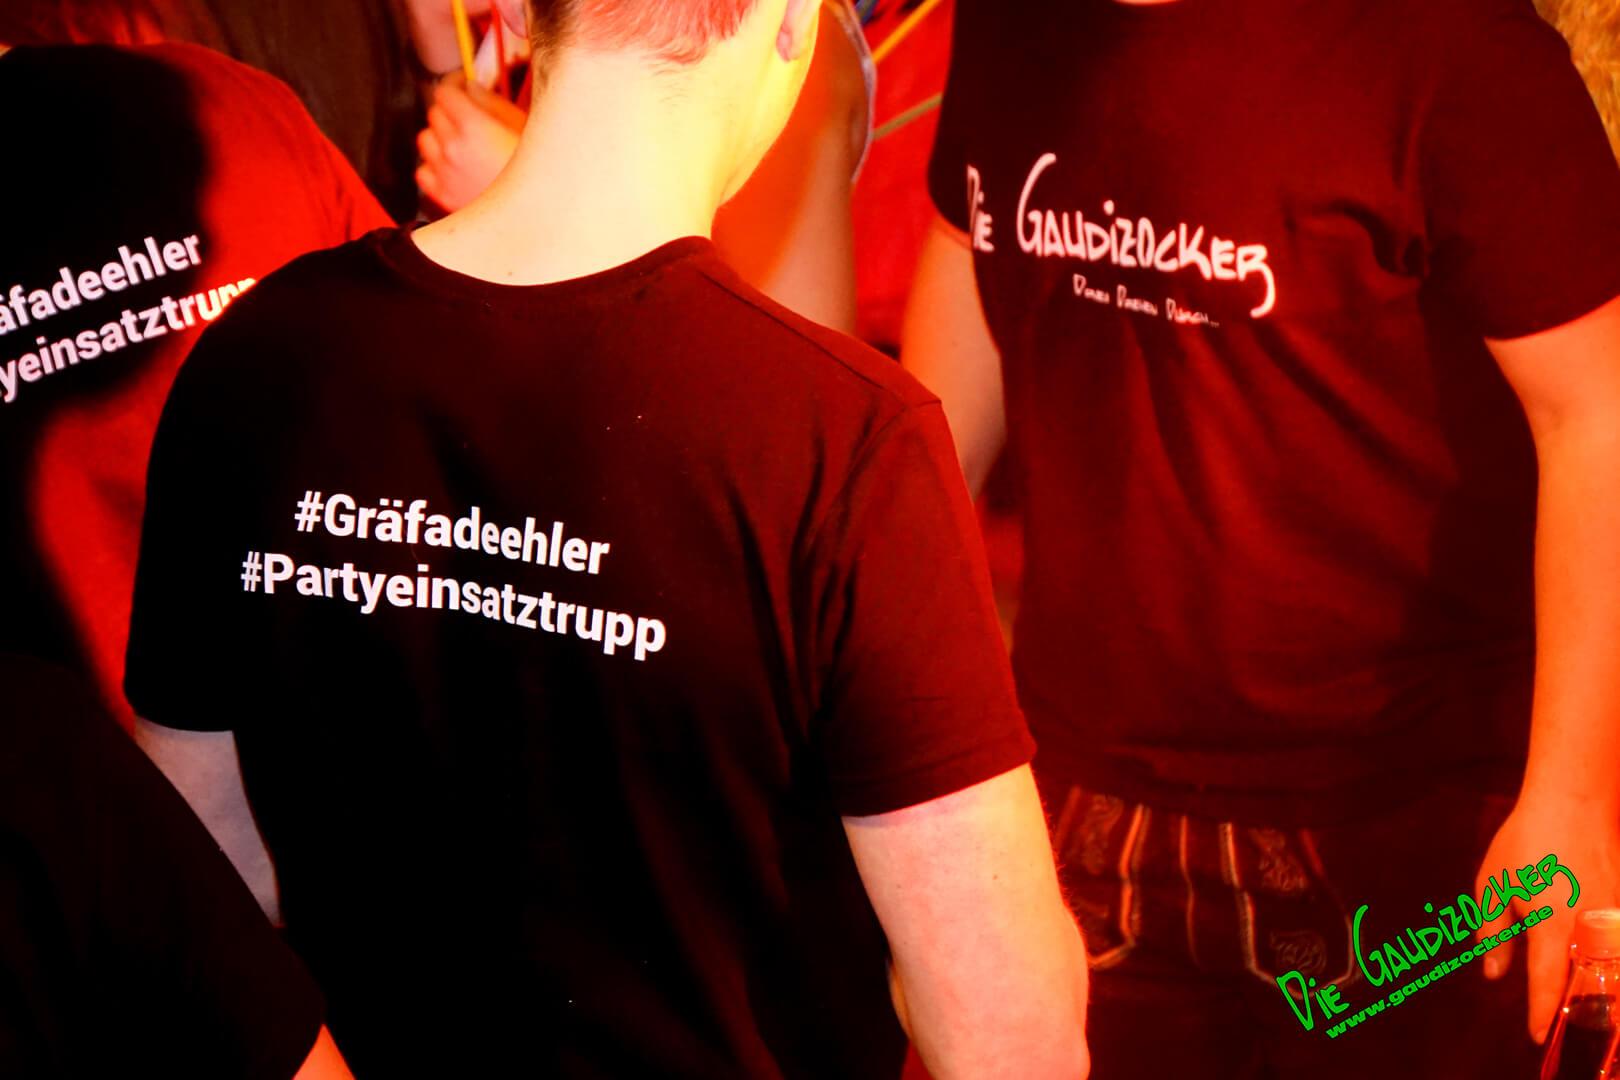 Gaudizocker live in Glashütten | 04.03.2019